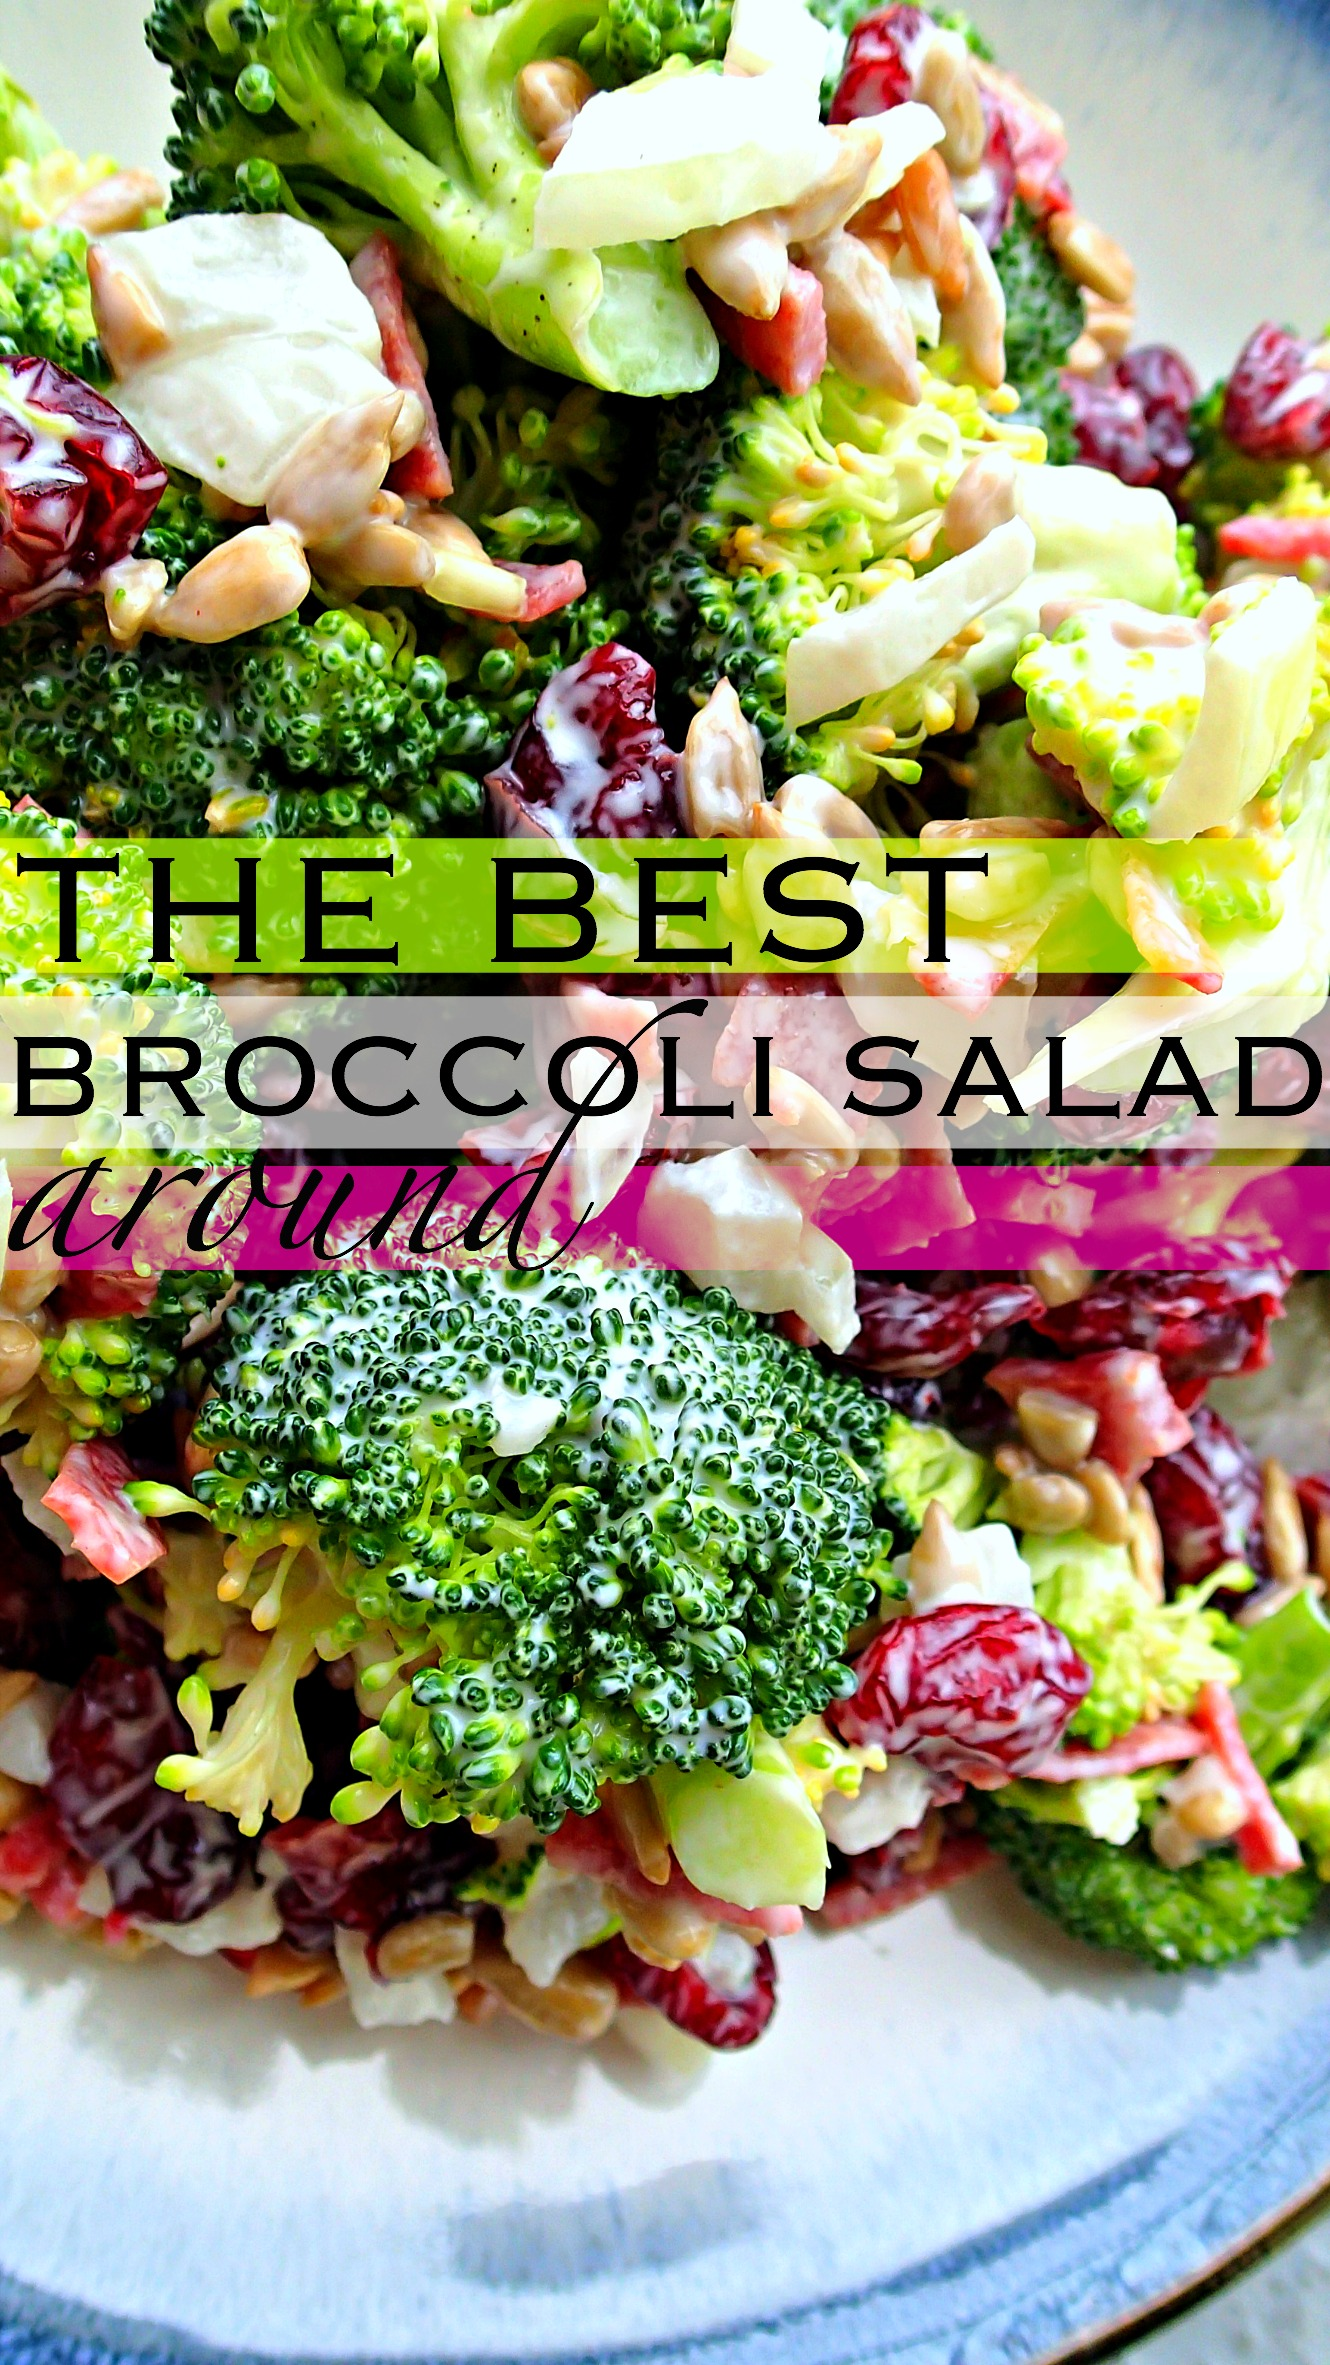 The Best Broccoli Salad Around | Simply Taralynn | Bloglovin'